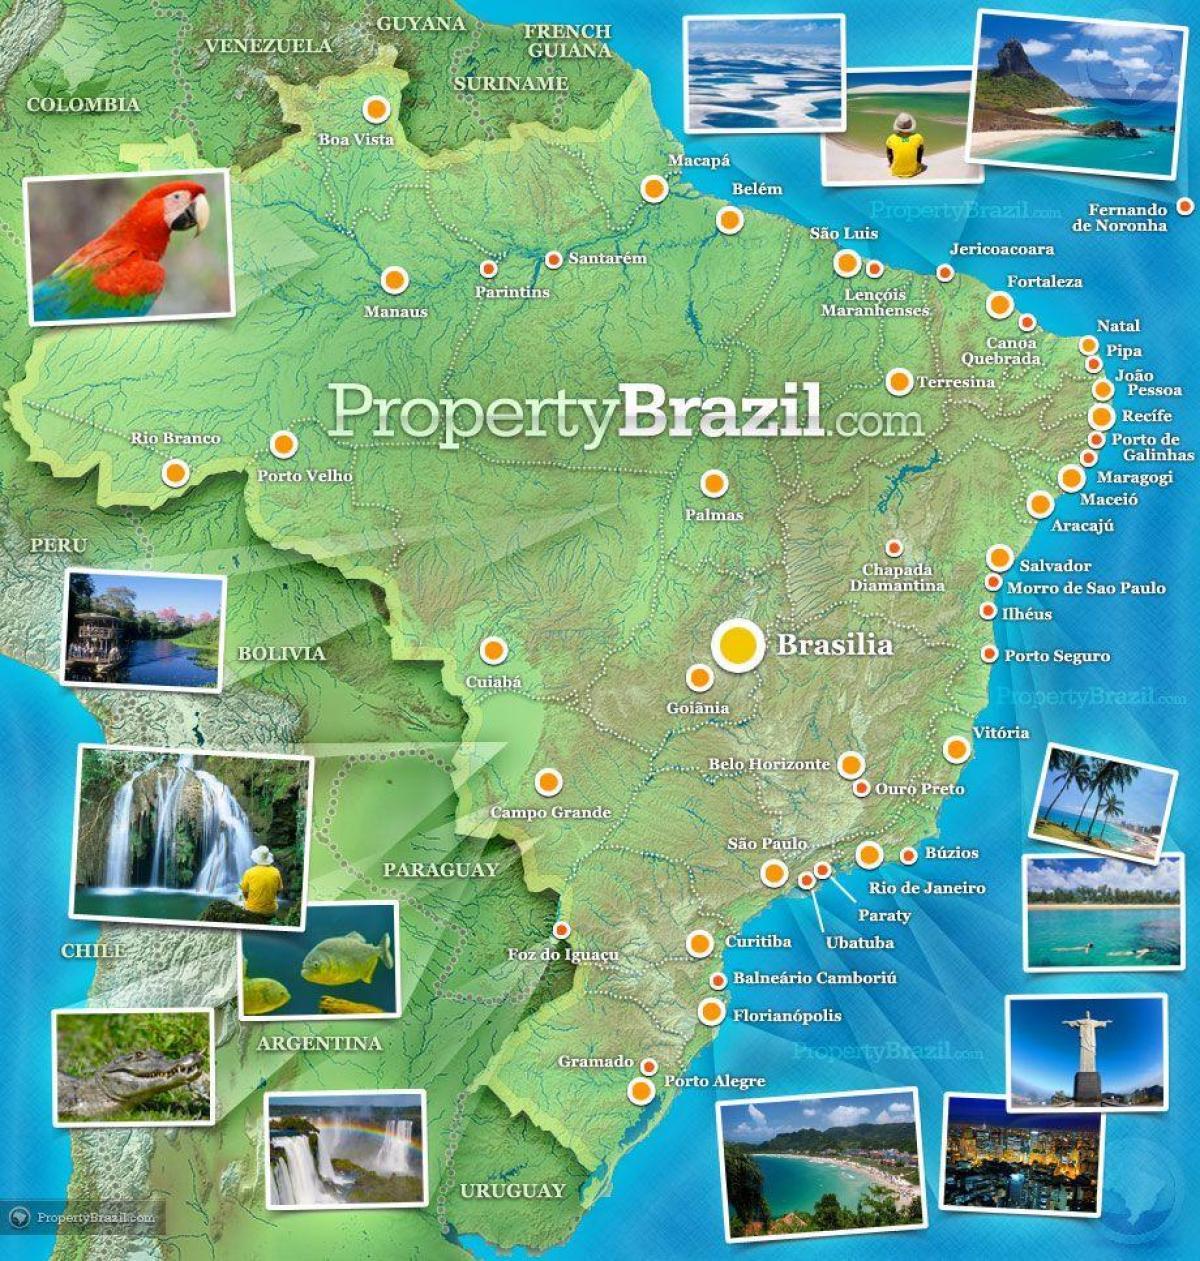 Brazil tourist map Tourist map of Brazil South America Americas